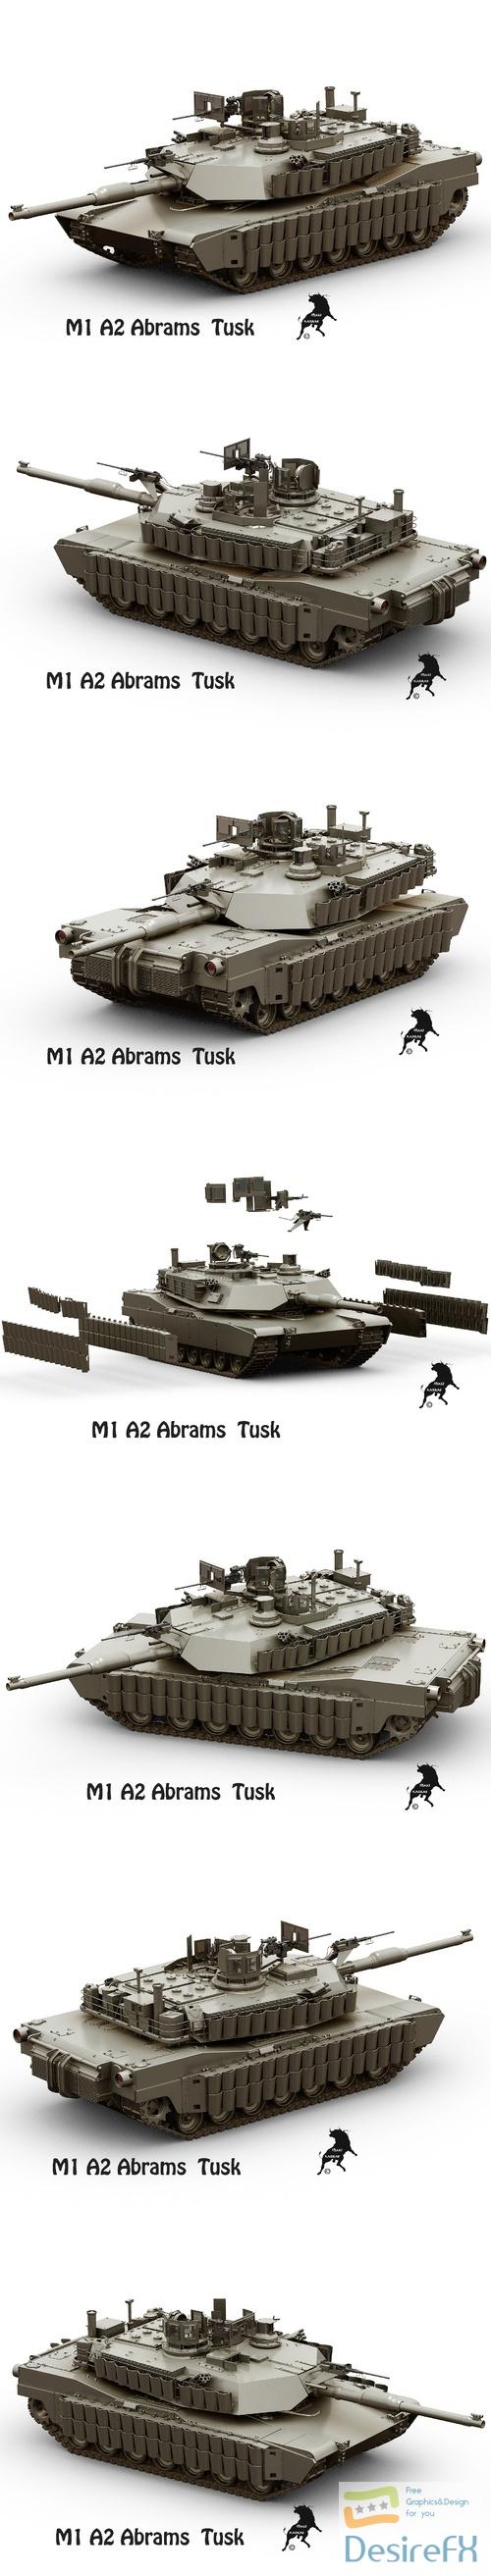 M-1 A2 Abrams Tusk Tank 3D Model